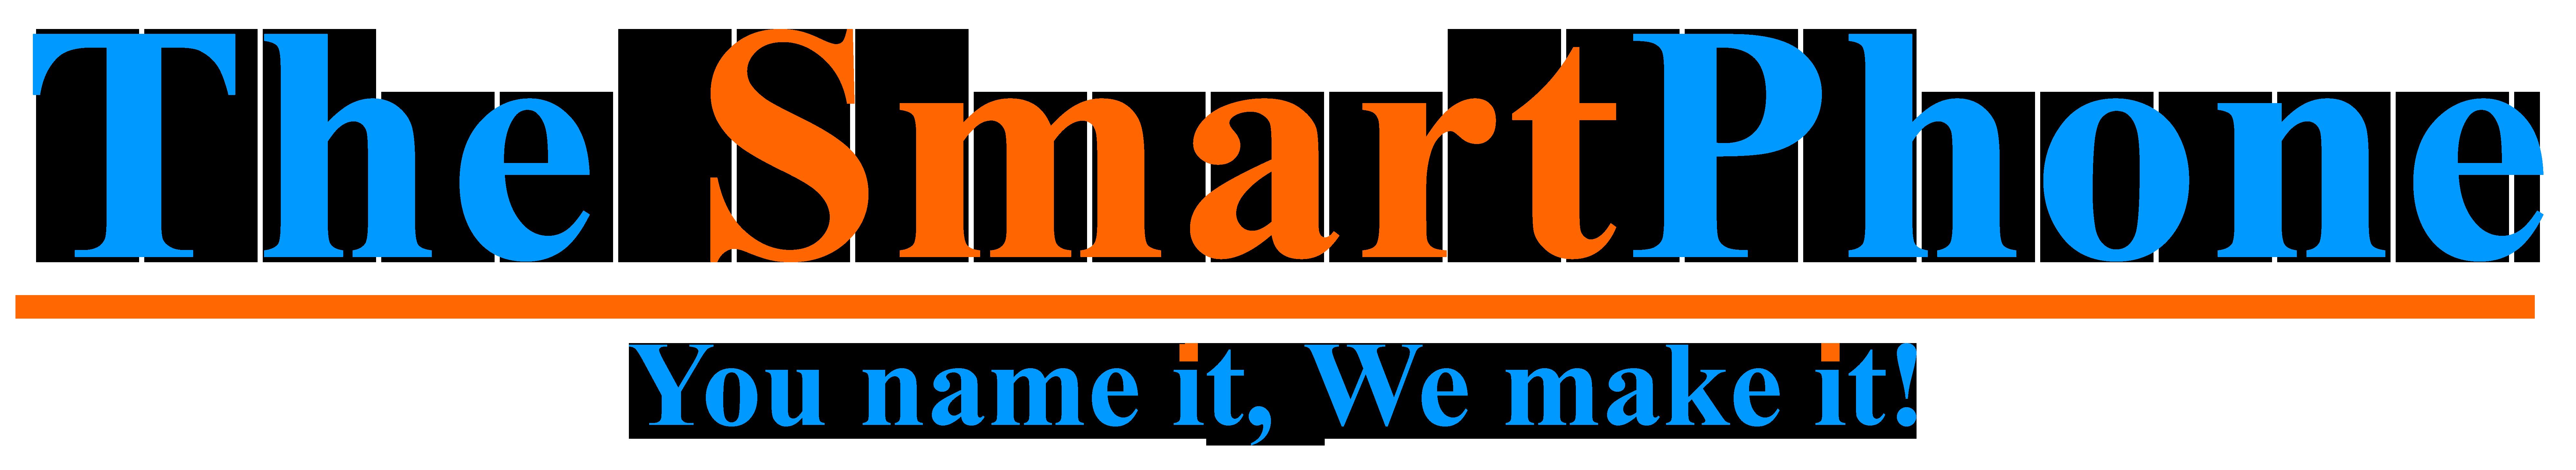 Logo The Smartphone